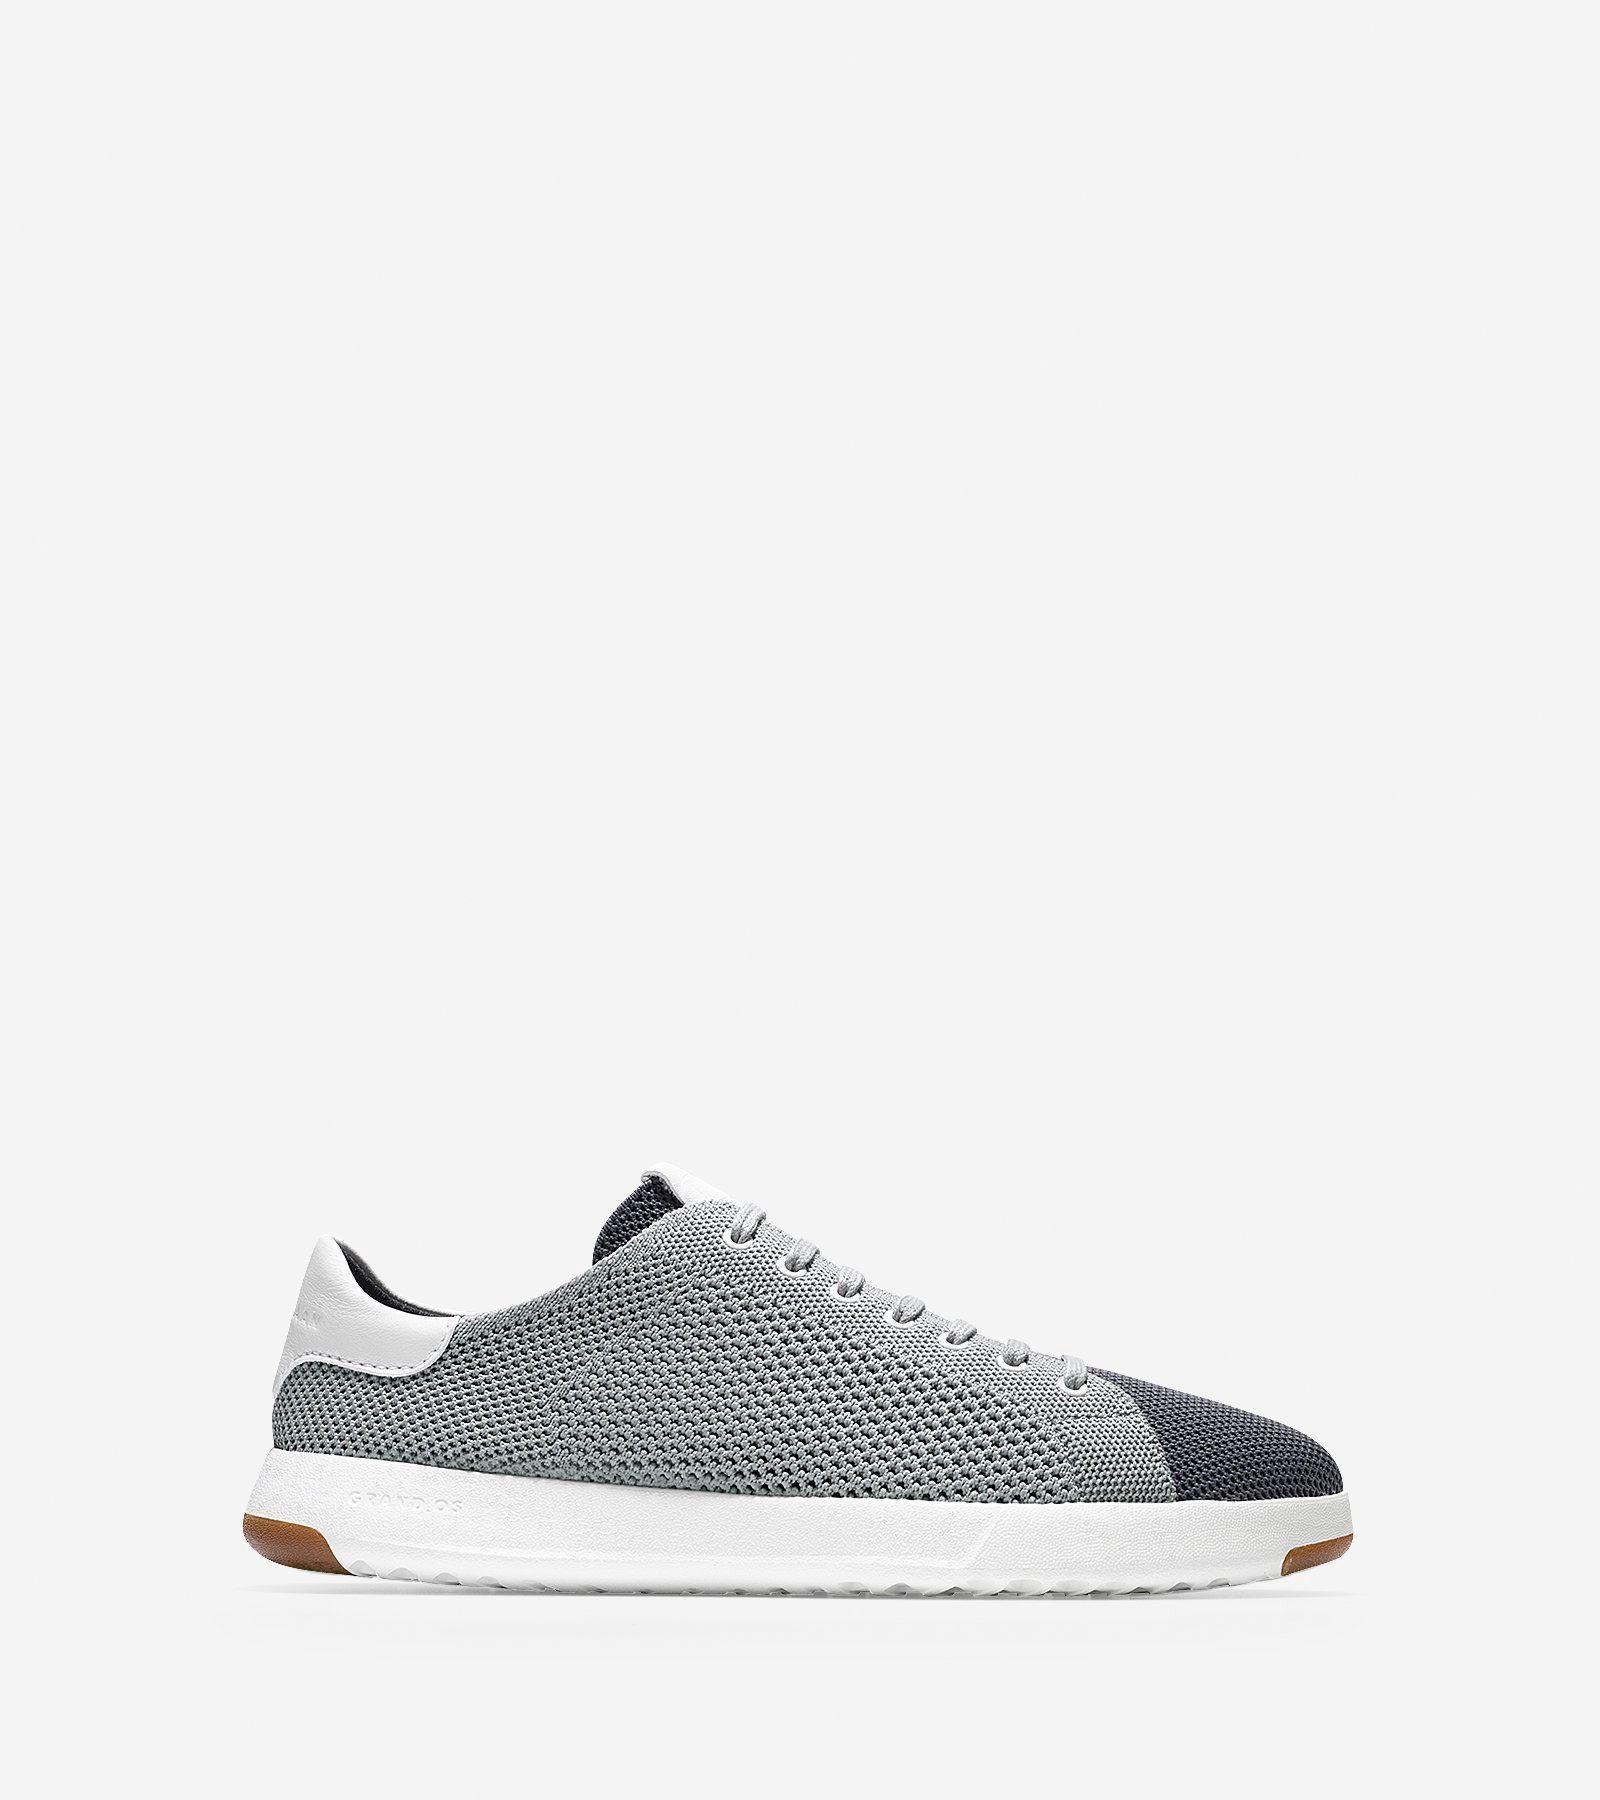 c2b3b2211be8de ZERØGRAND Stitchlite 2.0 stretch-knit oxford shoes--Black Shoes